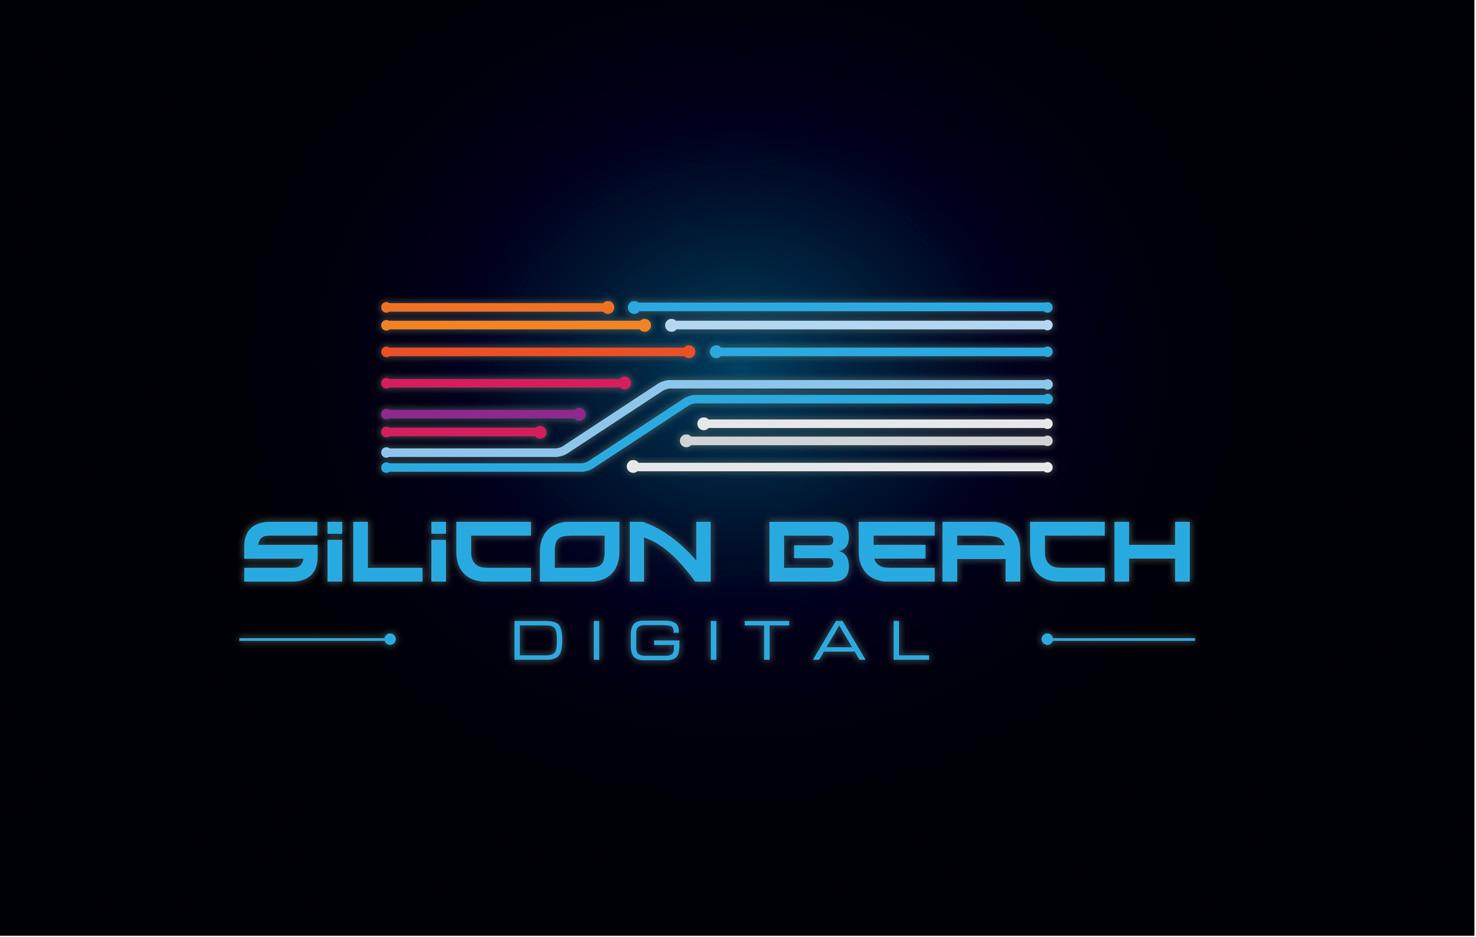 Help Silicon Beach Digital with a new logo